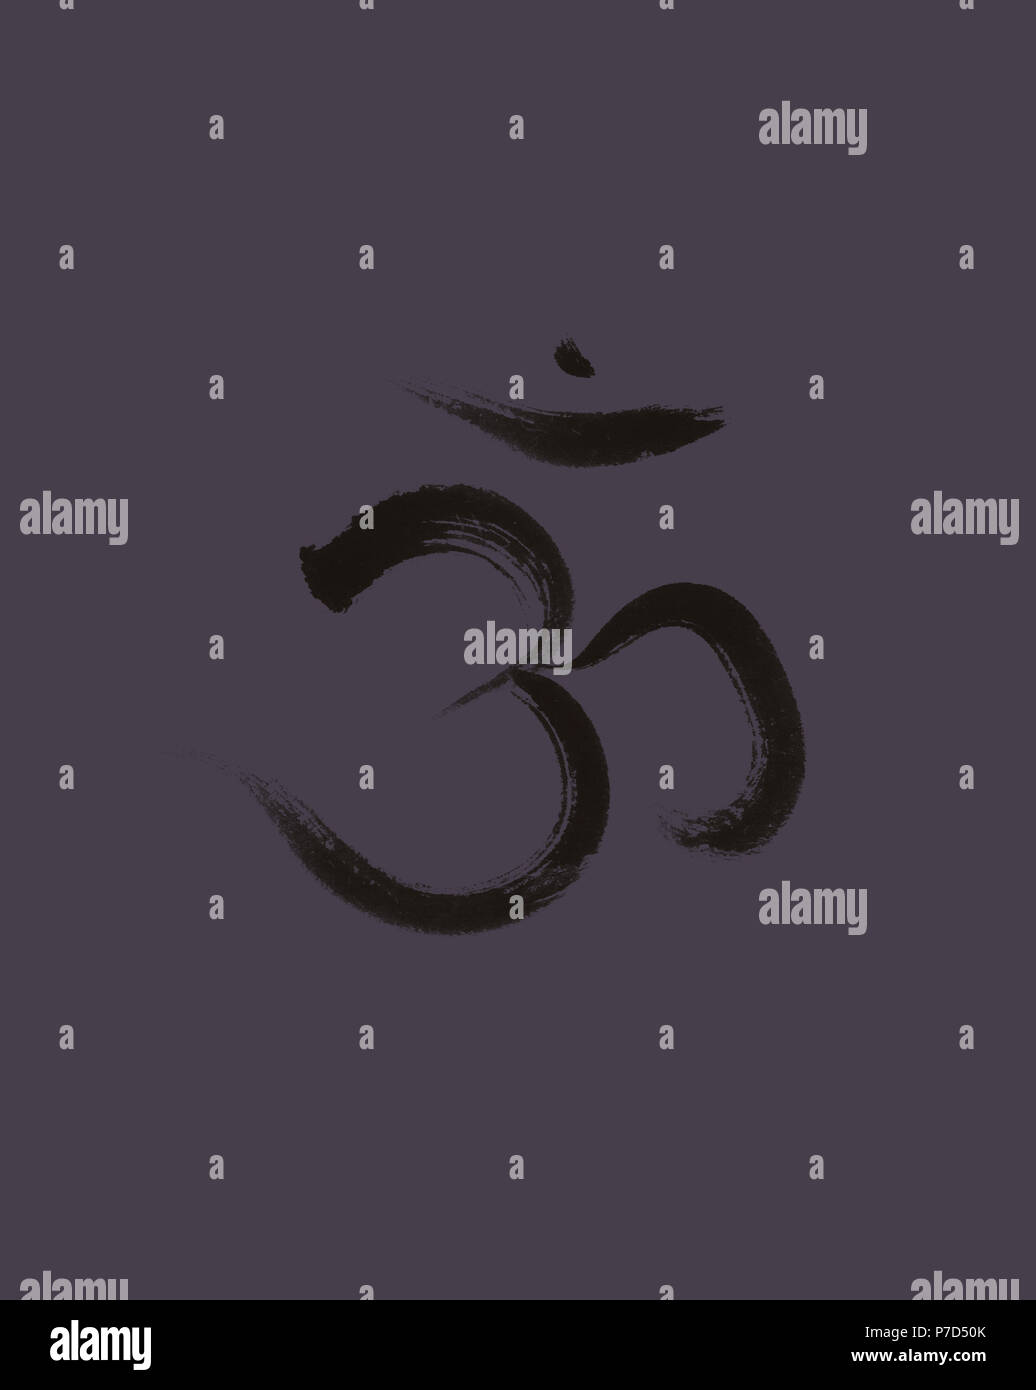 Sanscrit sacred symbol Om or Aum in Yoga, spiritual icon design on dark space gray background, Artistic Japanese Zen Stock Photo